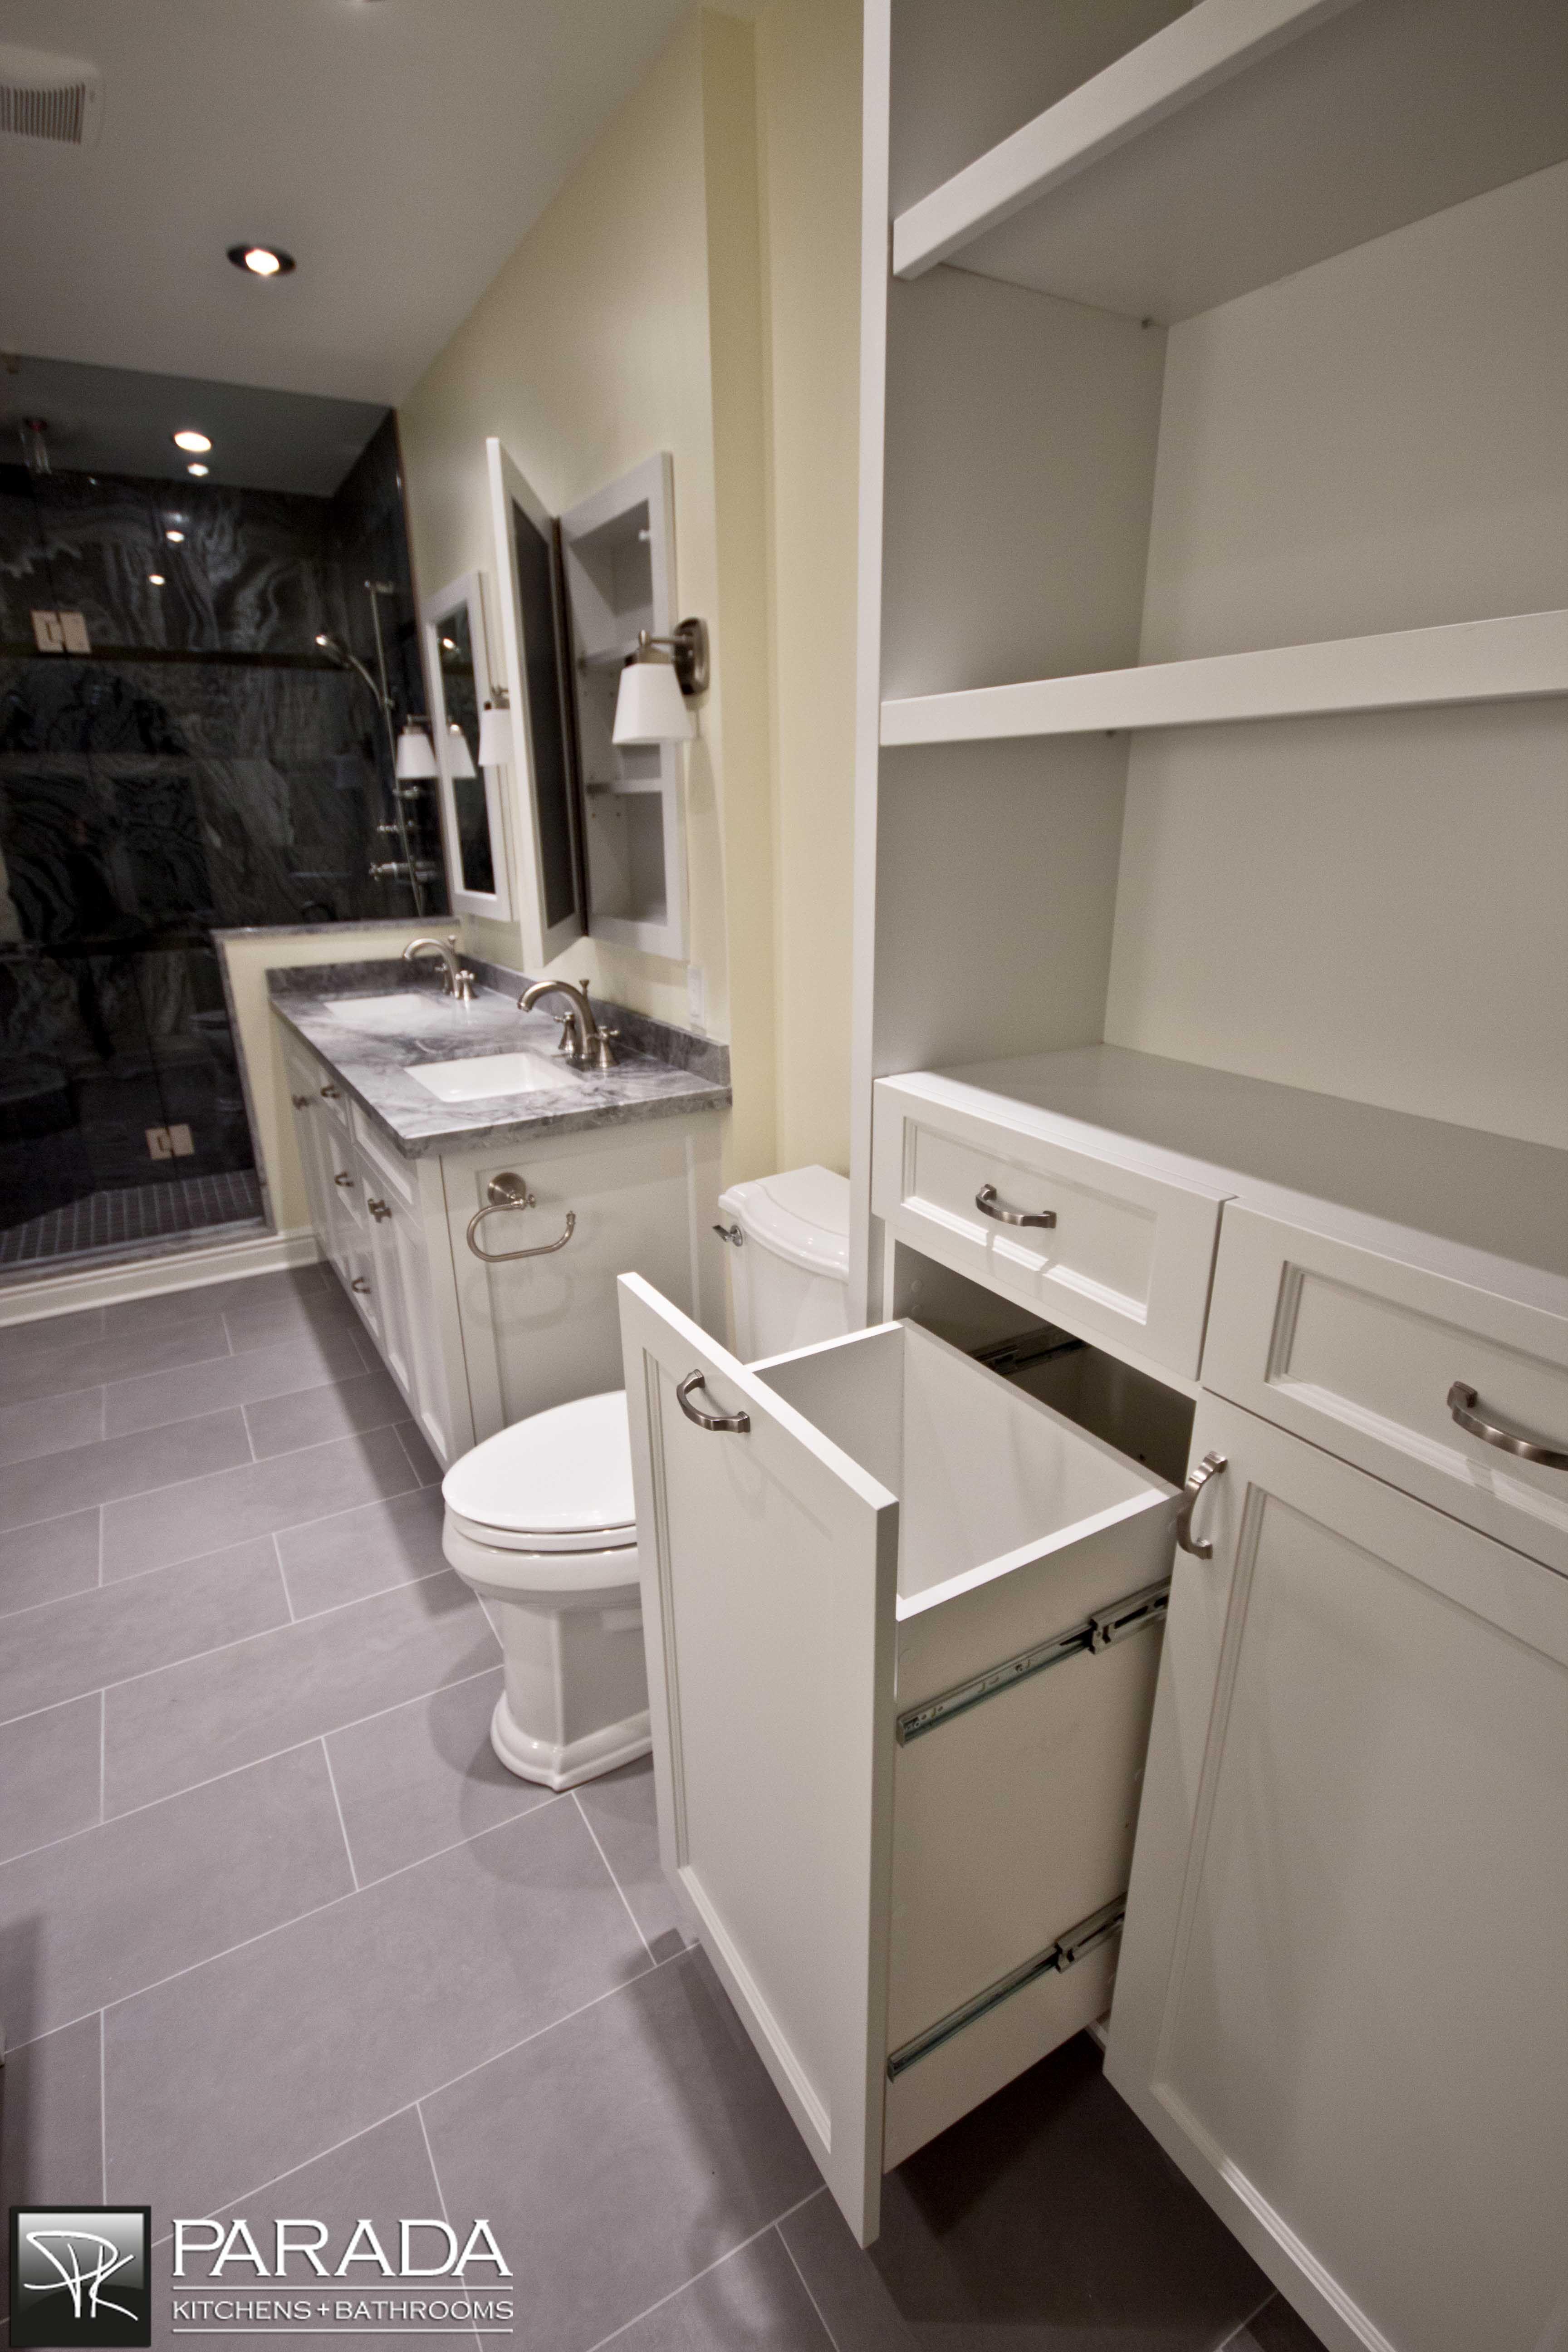 Bathroom Vanity Pull Out